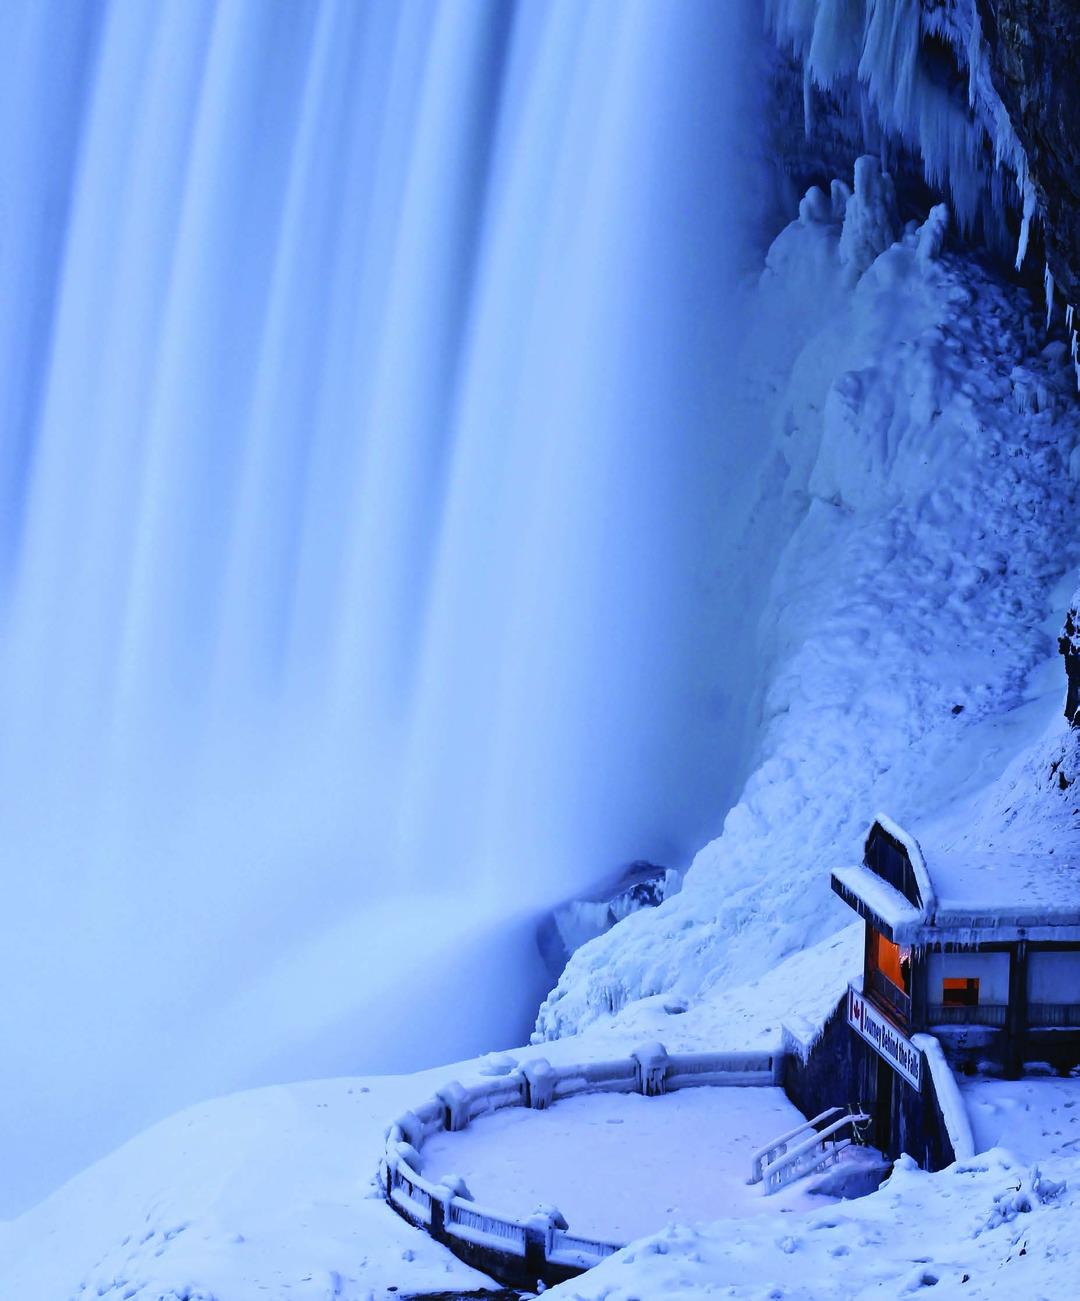 Page 56 of Niagara's Winter Playbook